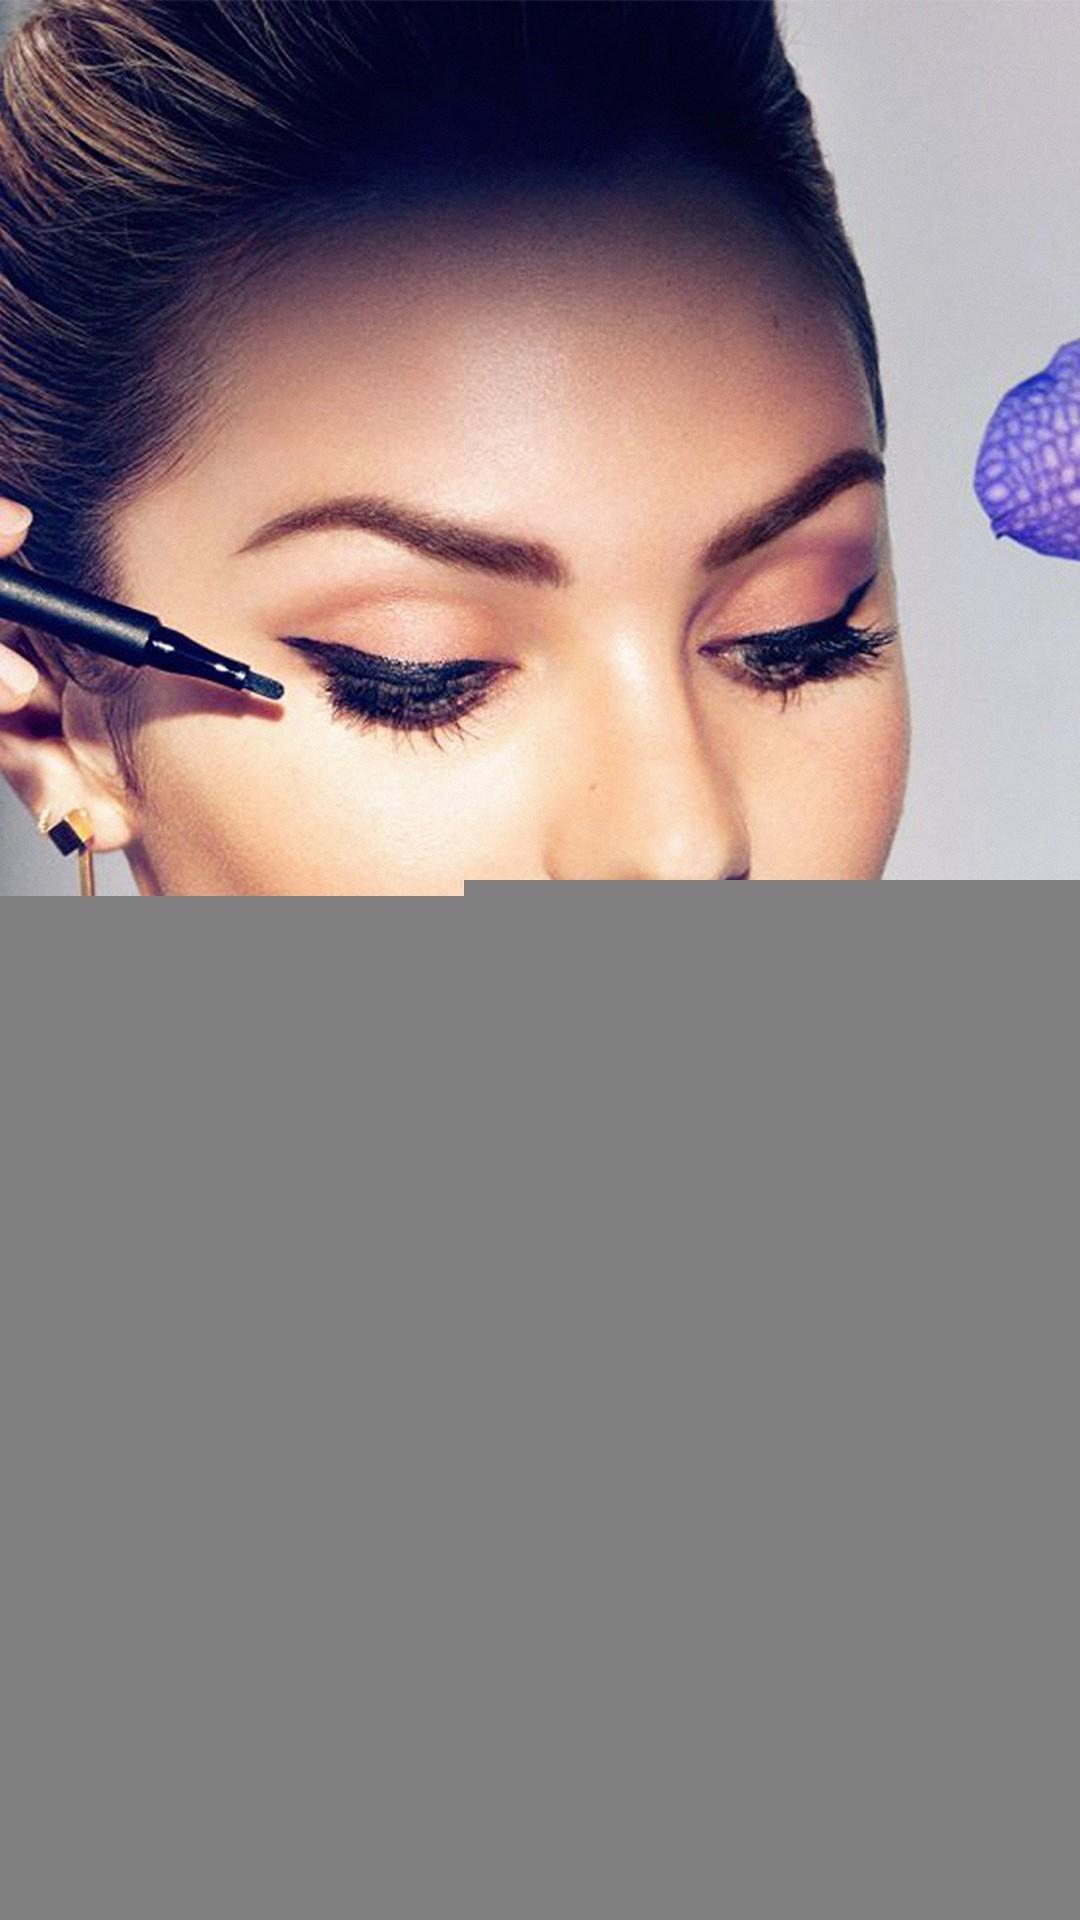 Candice Swanepoel Victoria Secret Model iPhone 8 wallpaper